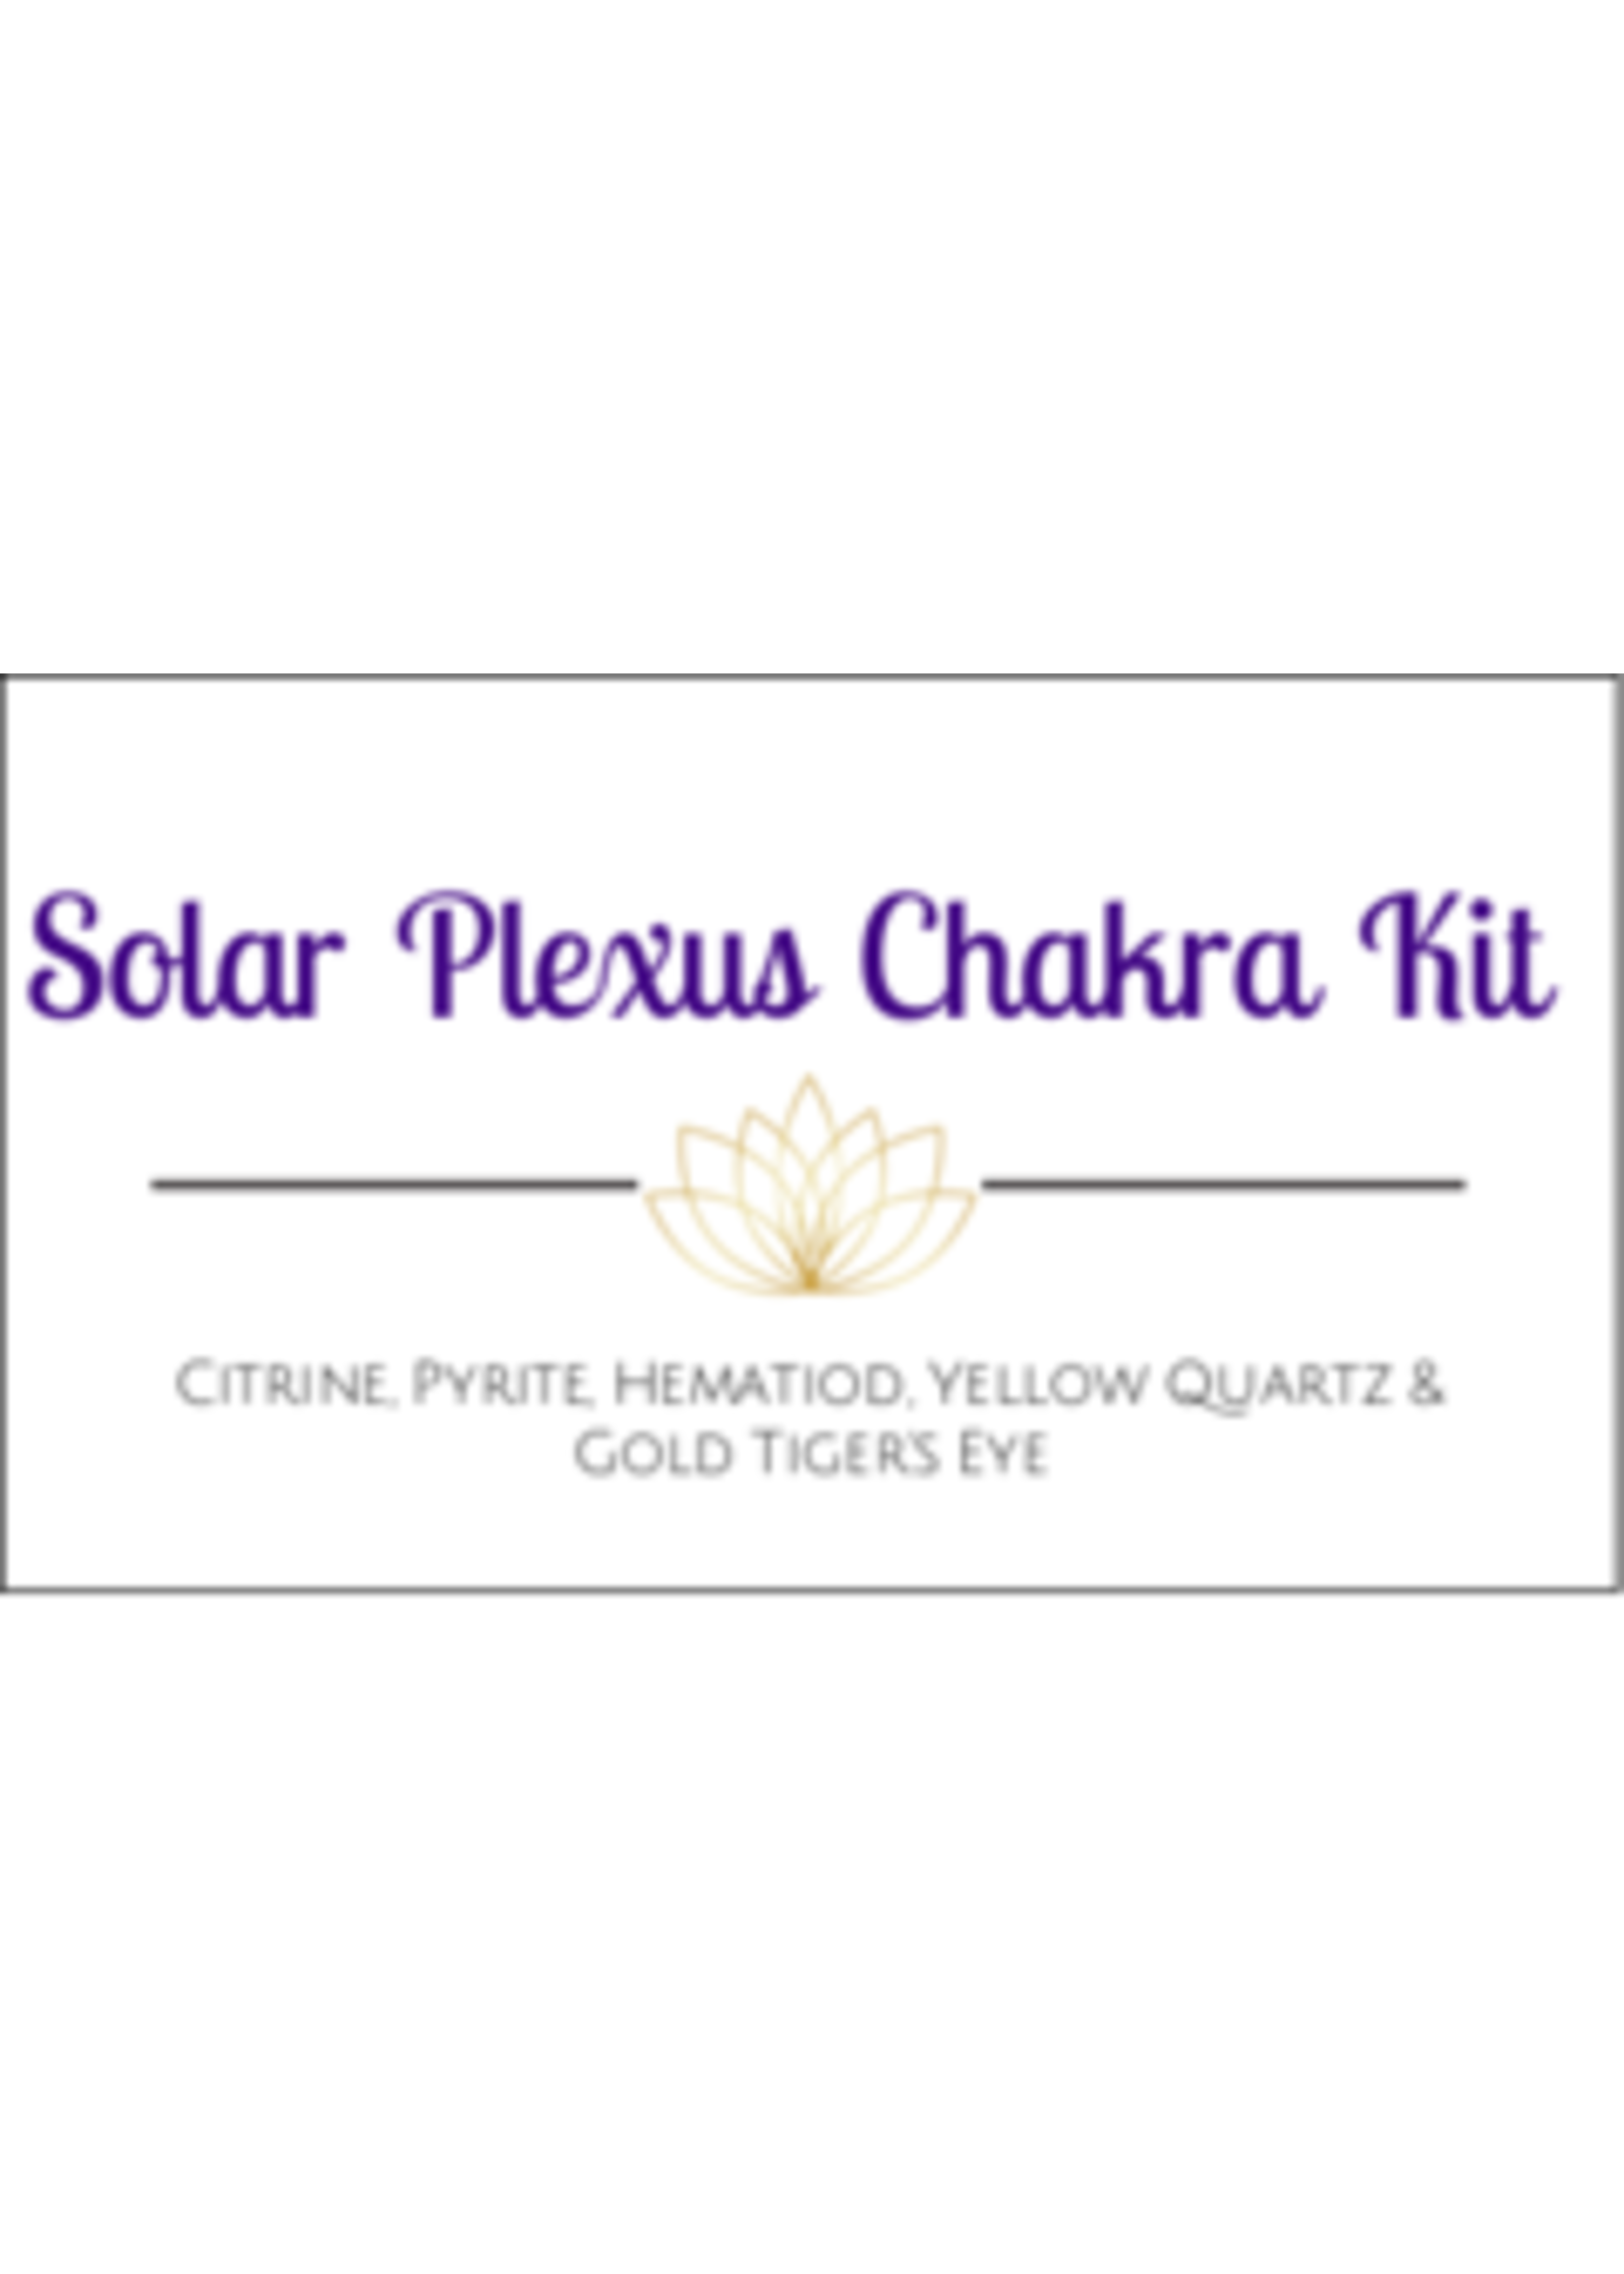 Solar Plexus Chakra Crystal Kit Cards - Box of 100